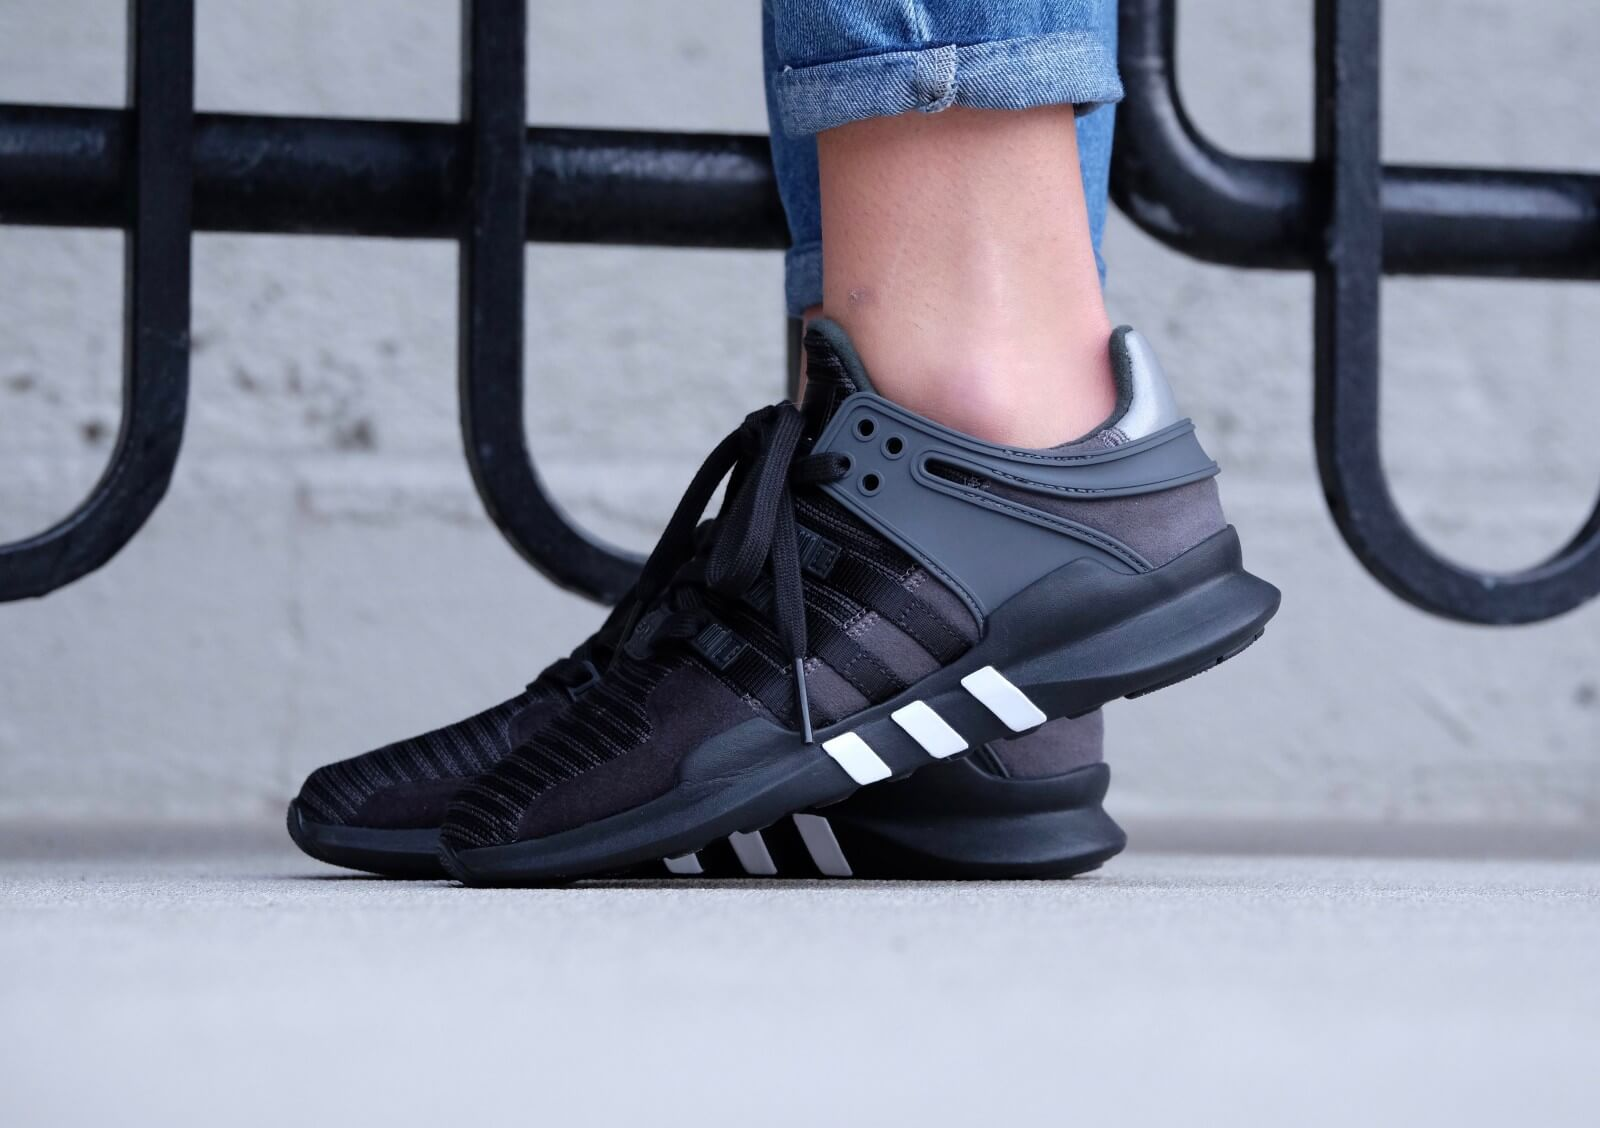 Adidas EQT Support ADV Core Black / Utility Black / DGH Solid Grey